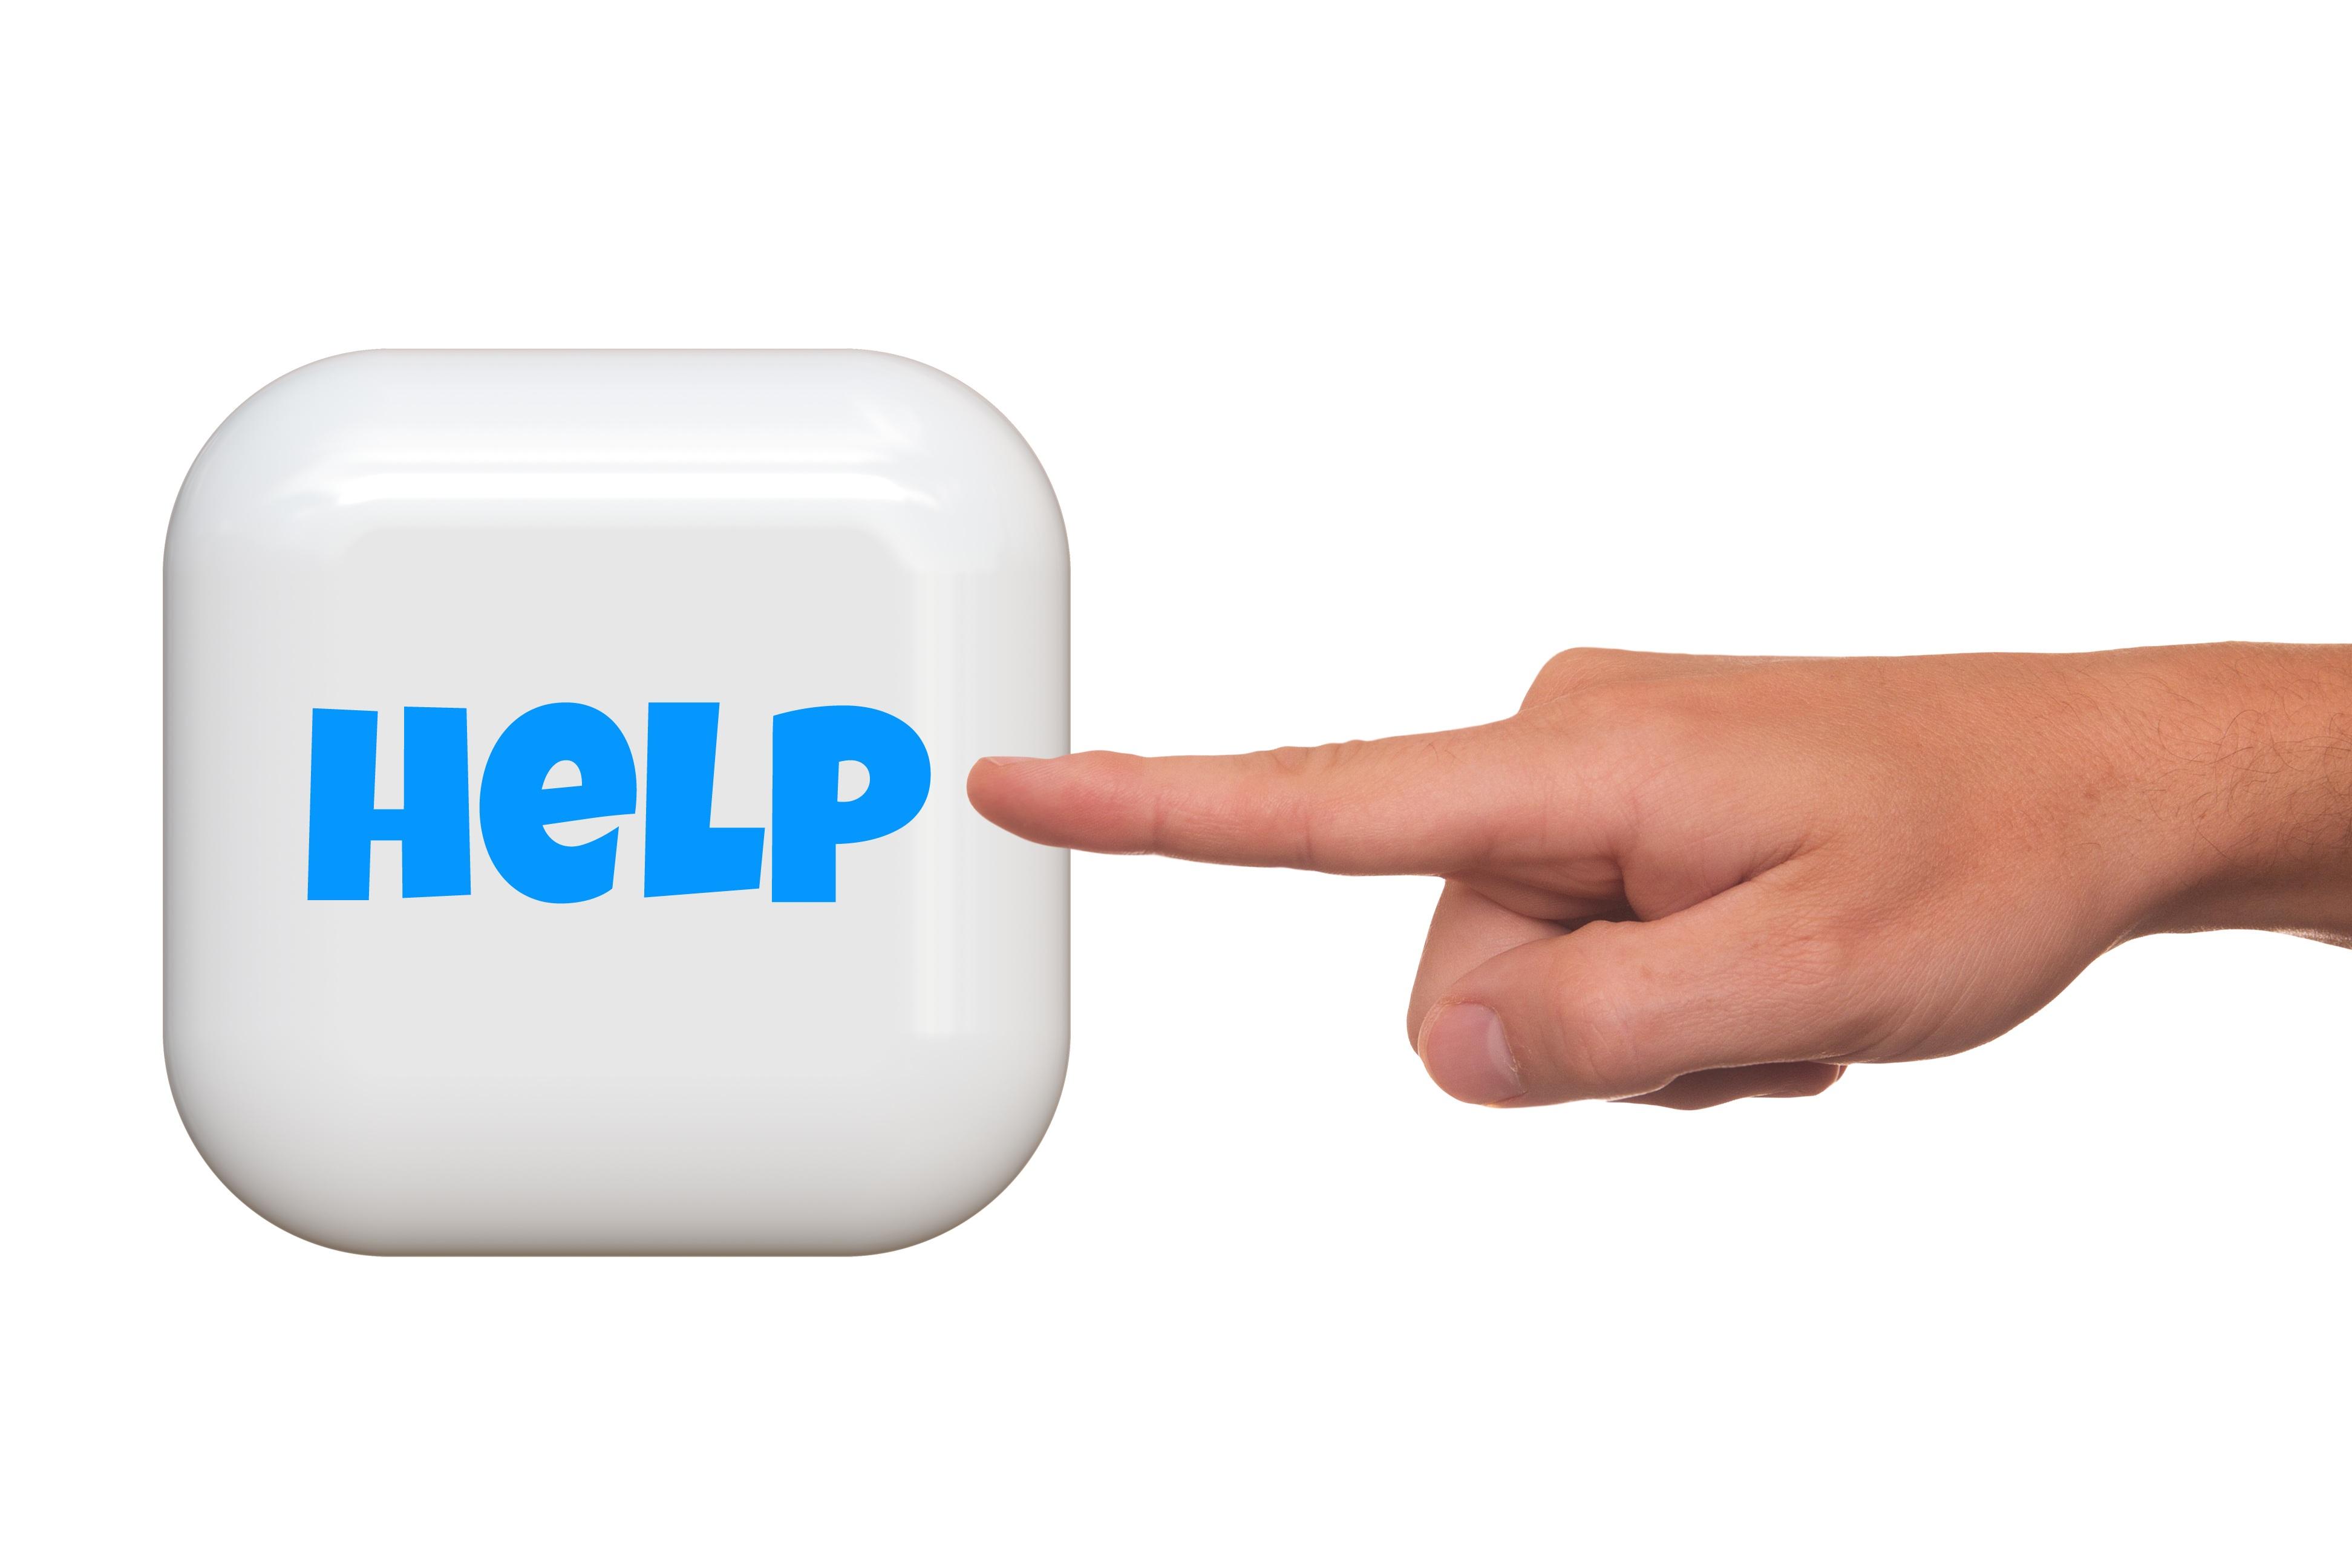 help-1276257